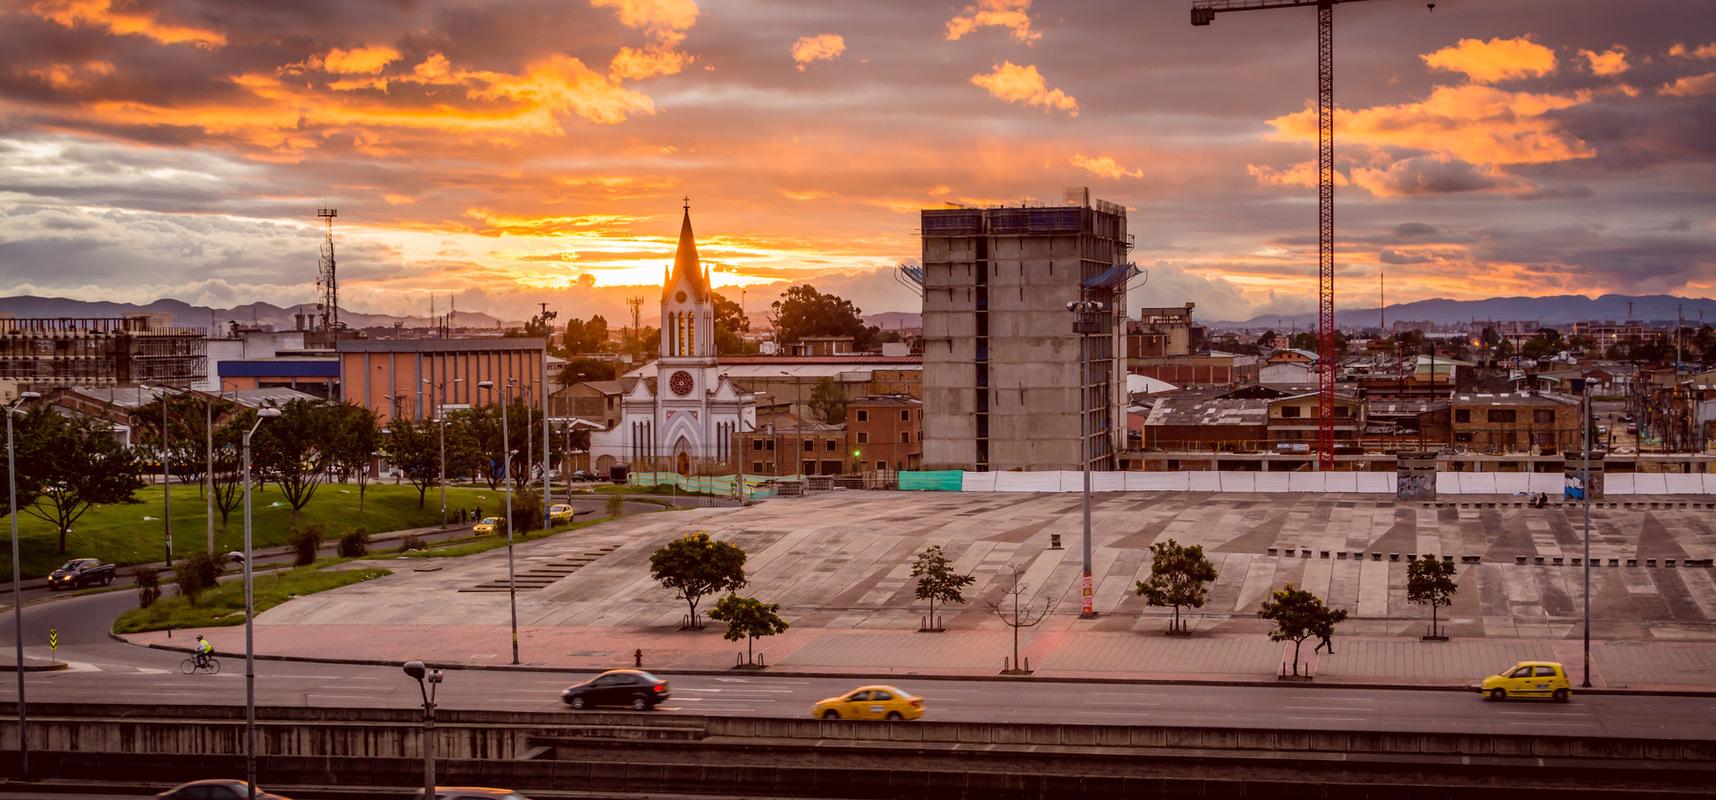 German Niño Fotografia - Atardecer en Bogotá - La antigua y moderna Bogotá